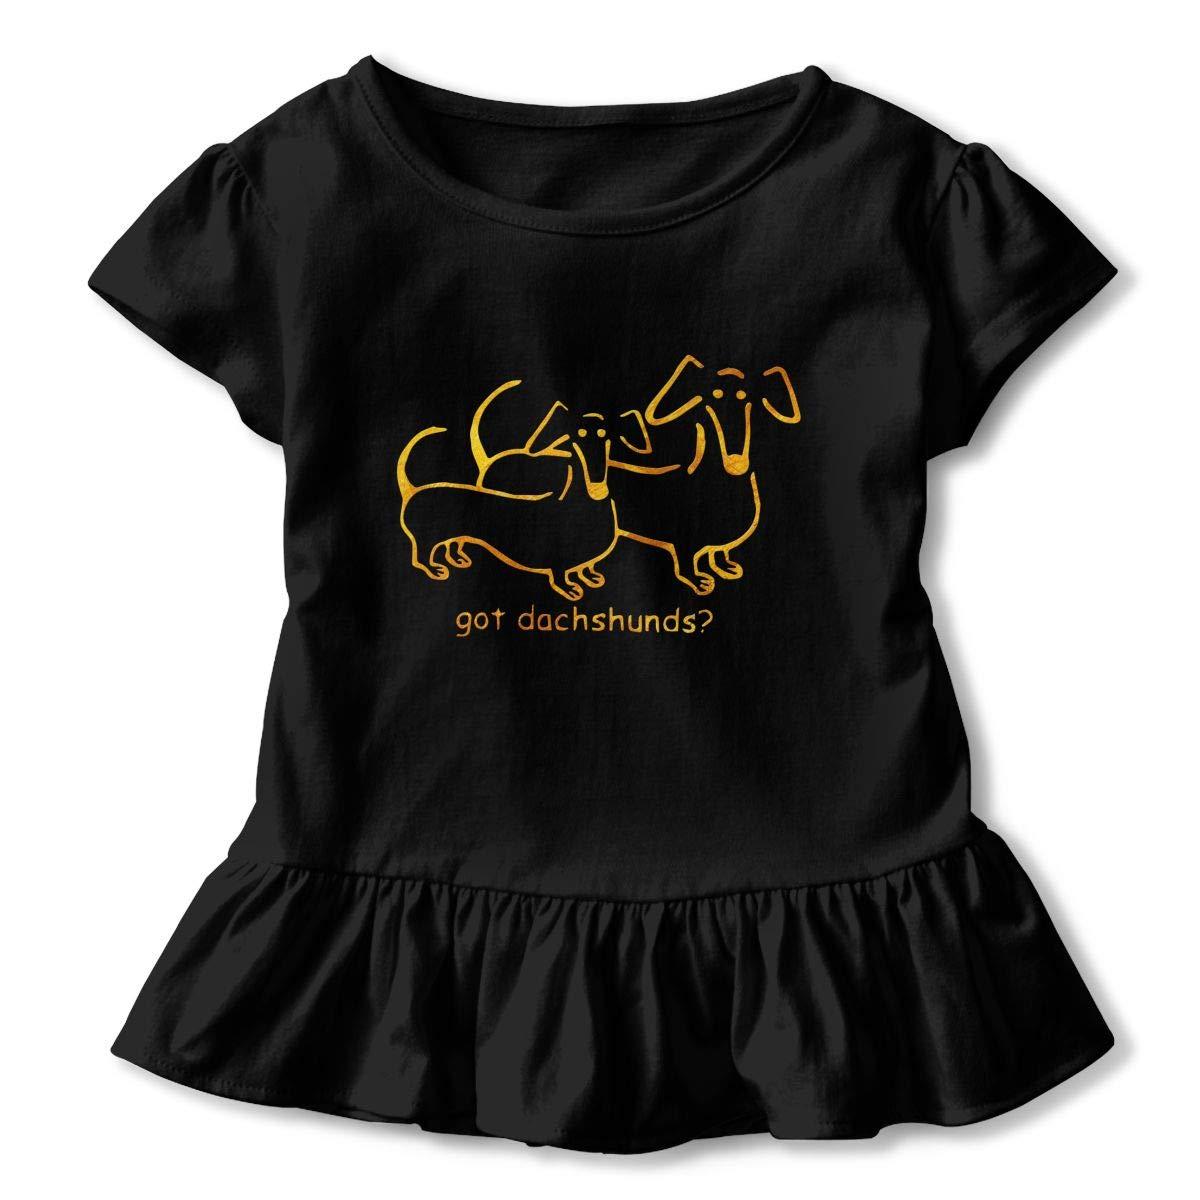 Clarissa Bertha Got Dachshunds Dog Funny Toddler Baby Girls Short Sleeve Ruffle T-Shirt